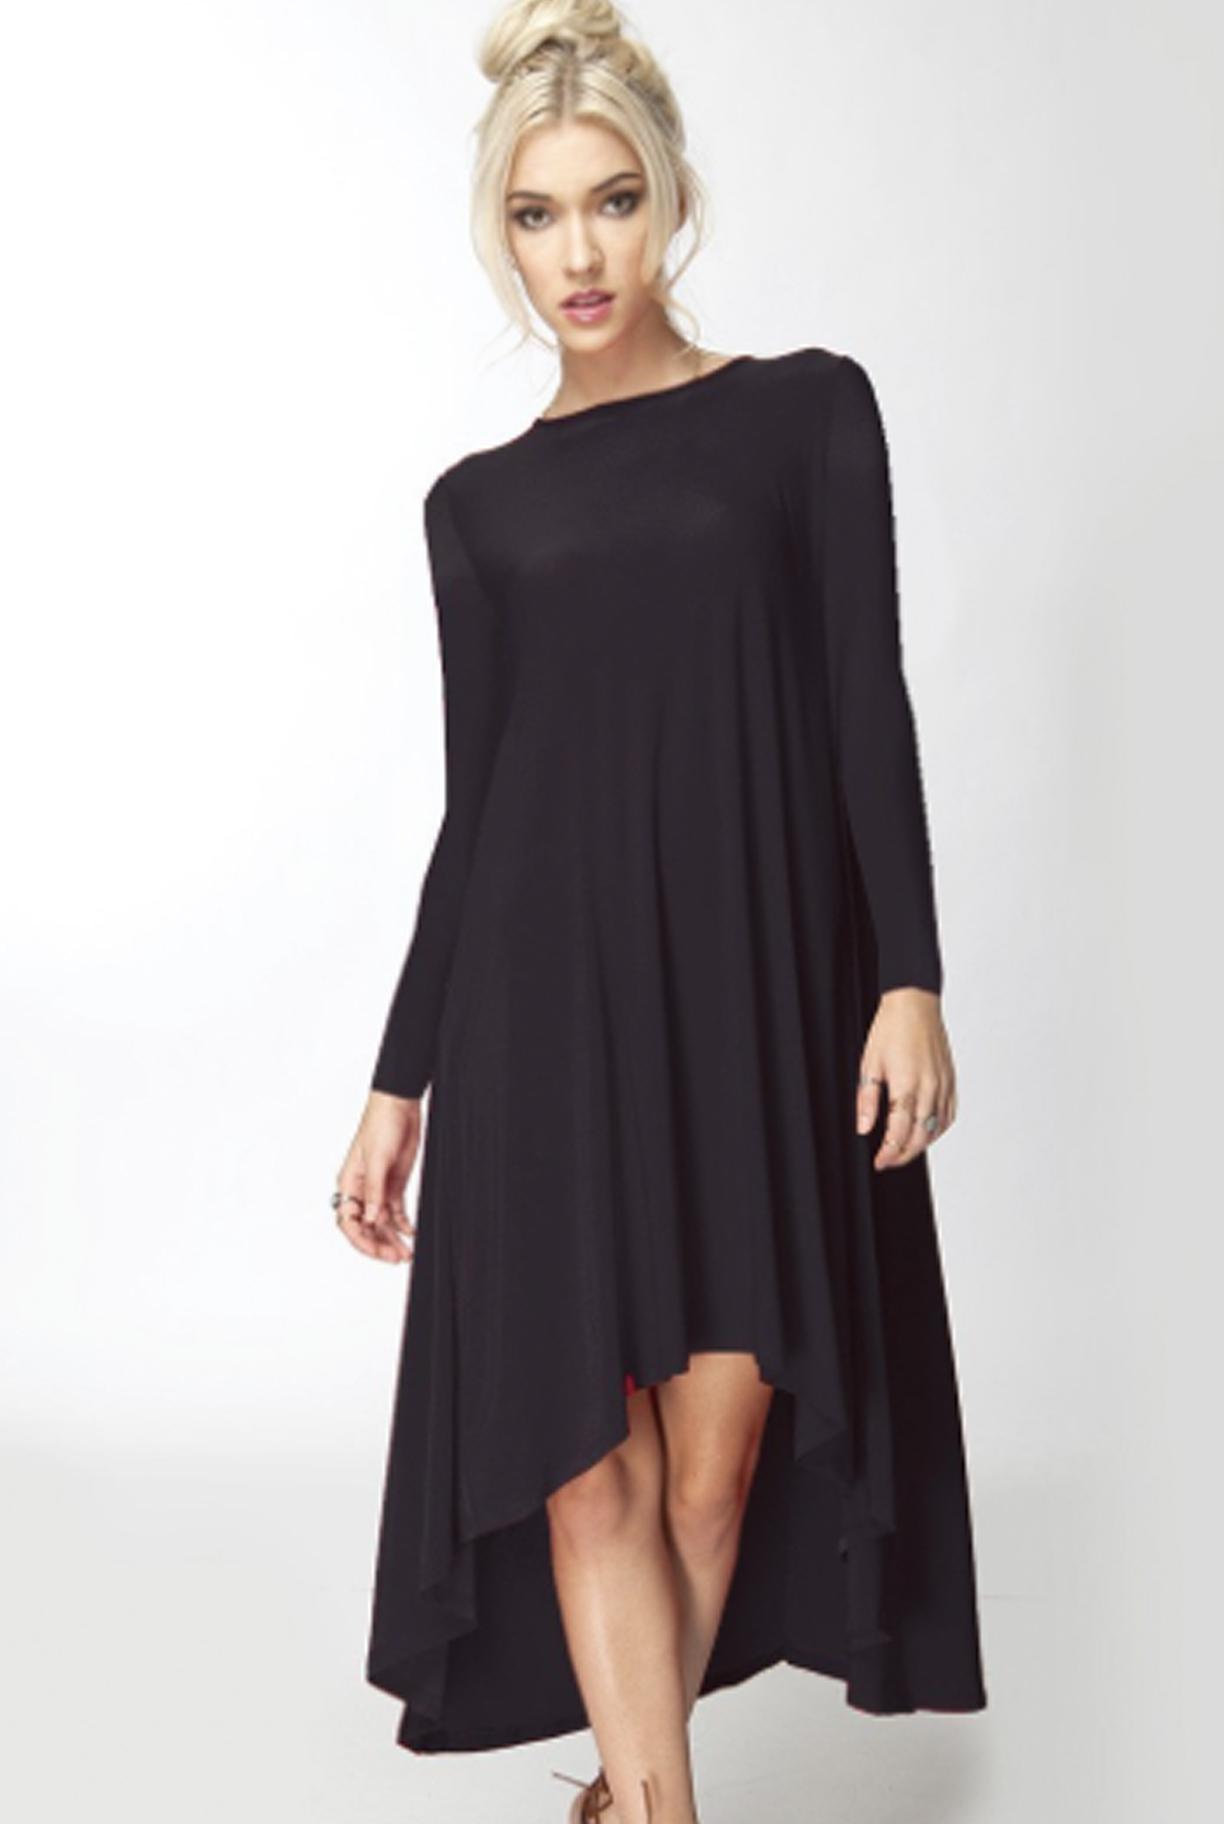 The Meredith Black Long Sleeve Hi Lo Drape Dress Long Sleeve High Low Dress Navy Blue Long Sleeve Dress Dresses [ 1824 x 1224 Pixel ]